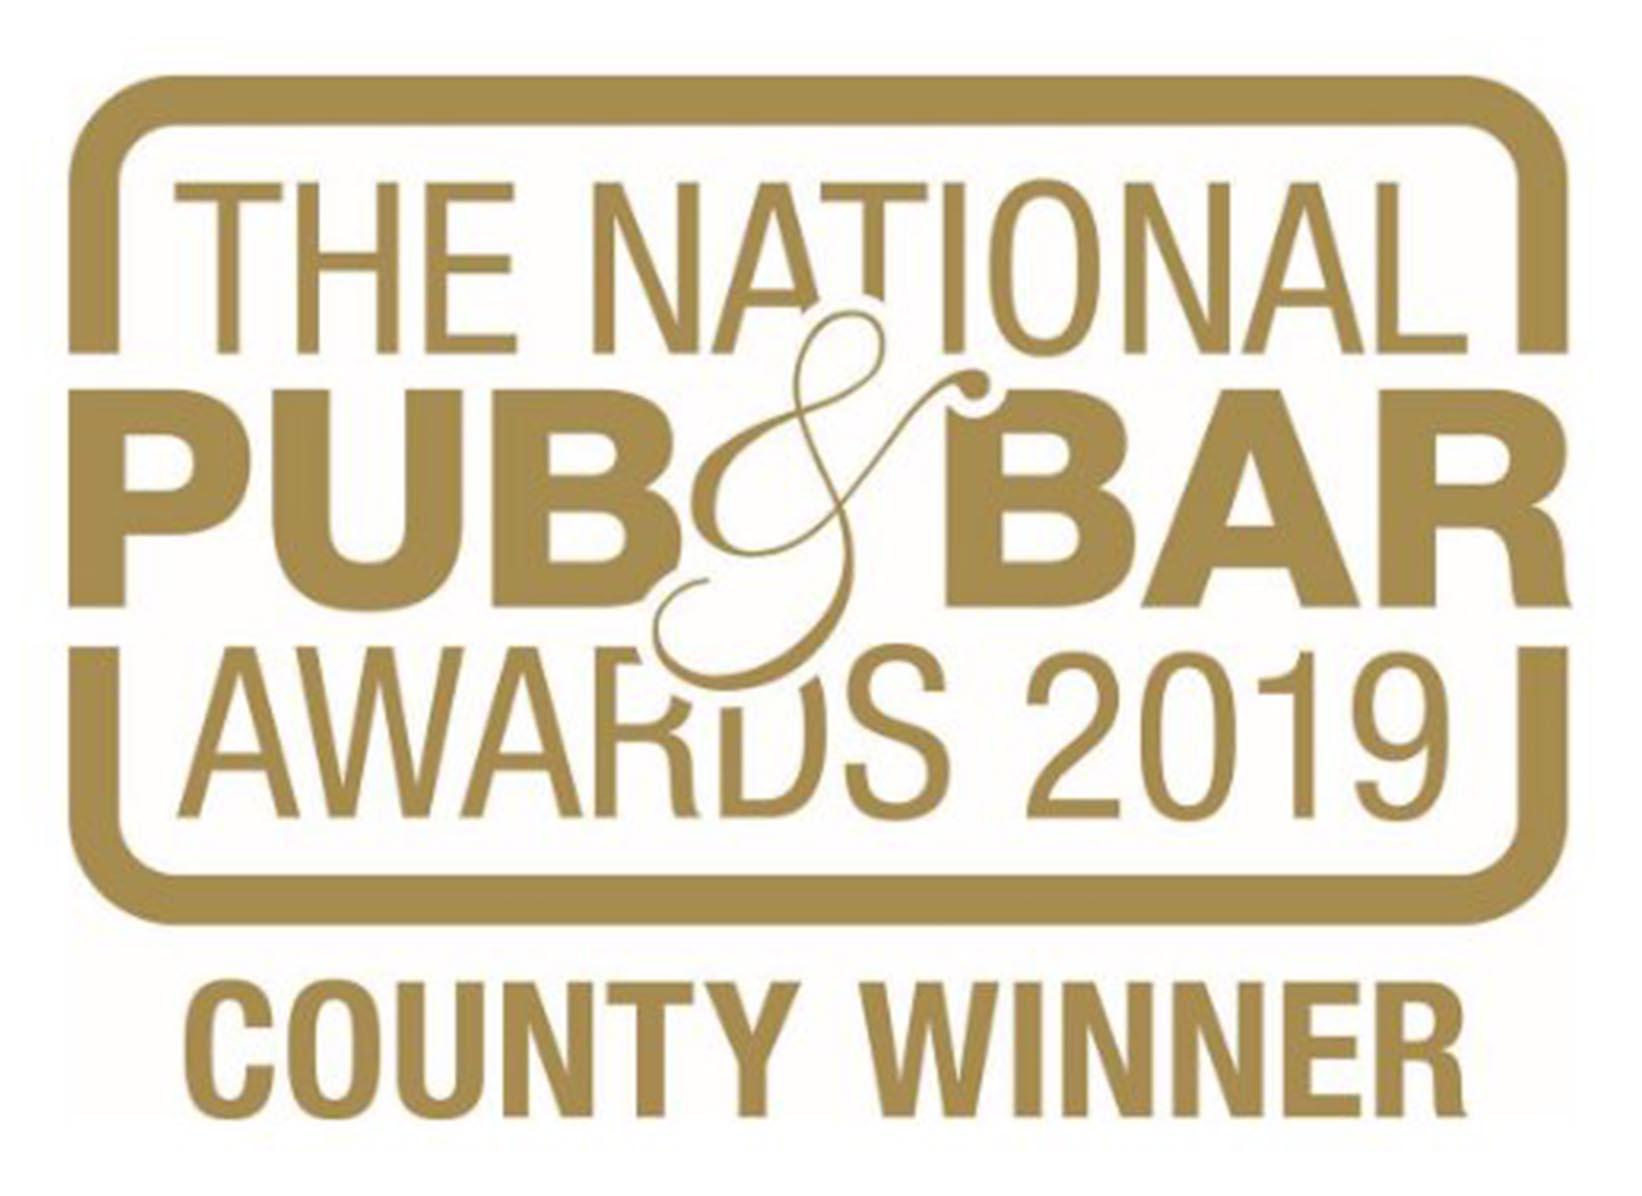 The National Pub & Bar Awards 2019 County Winner